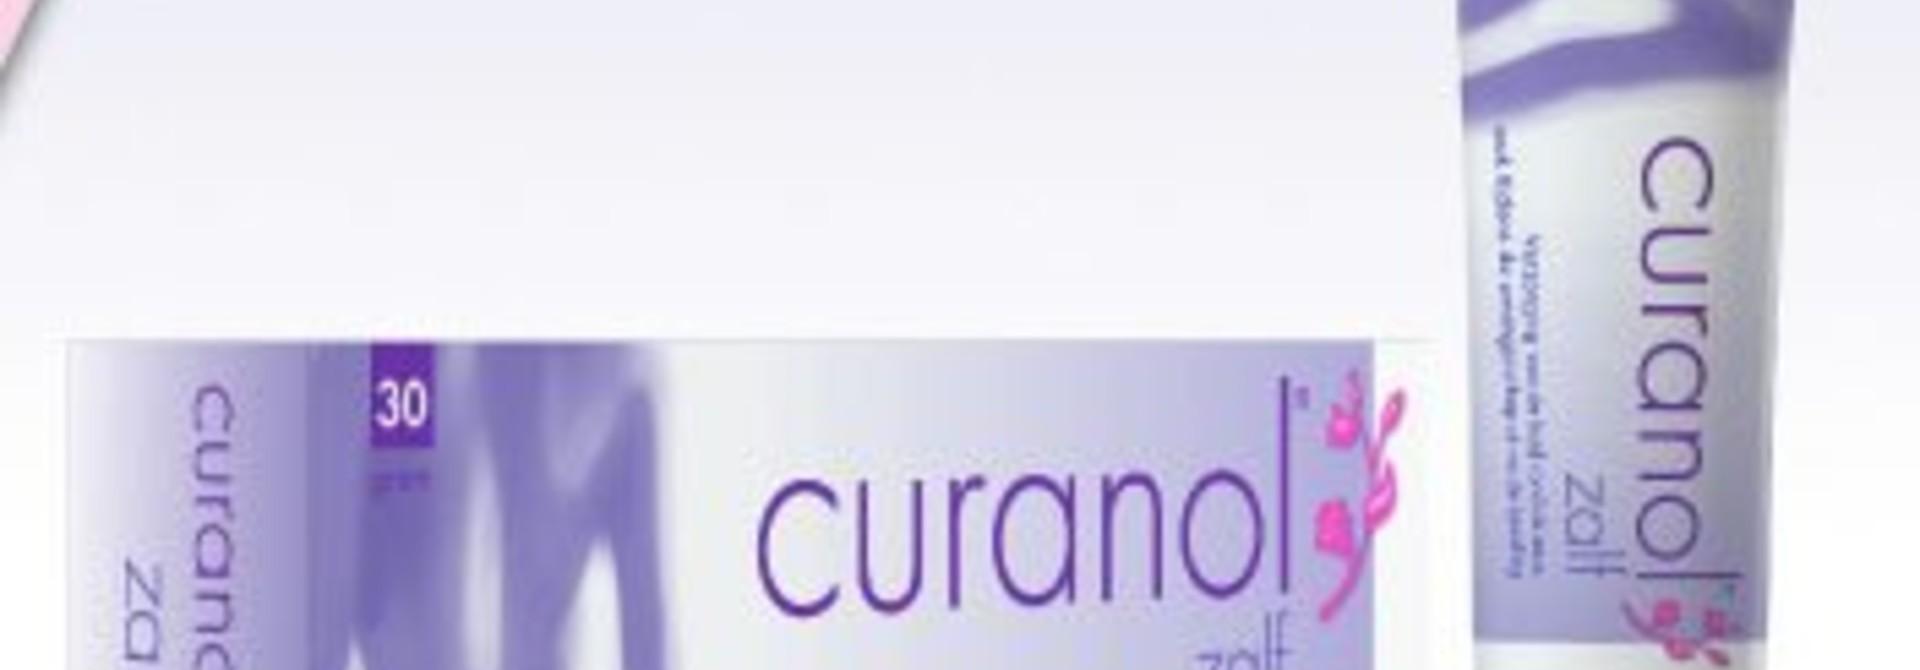 Curanol Zalf (Aambeien) 30 gram